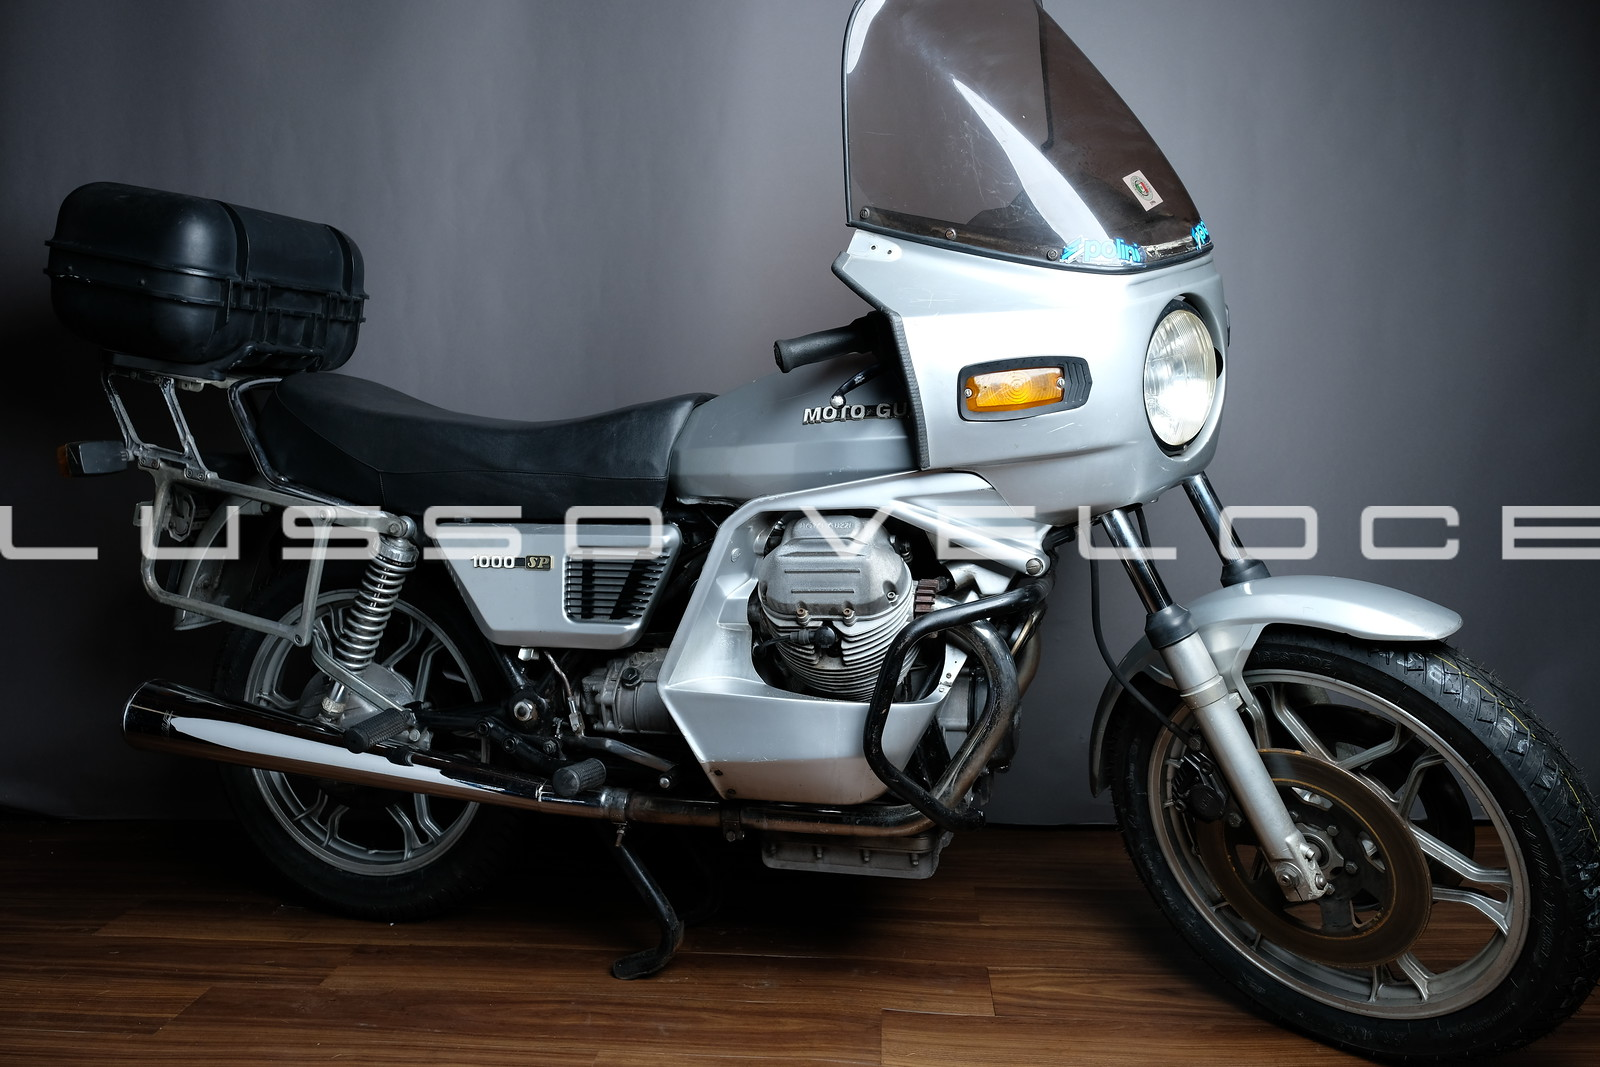 Moto Guzzi SP